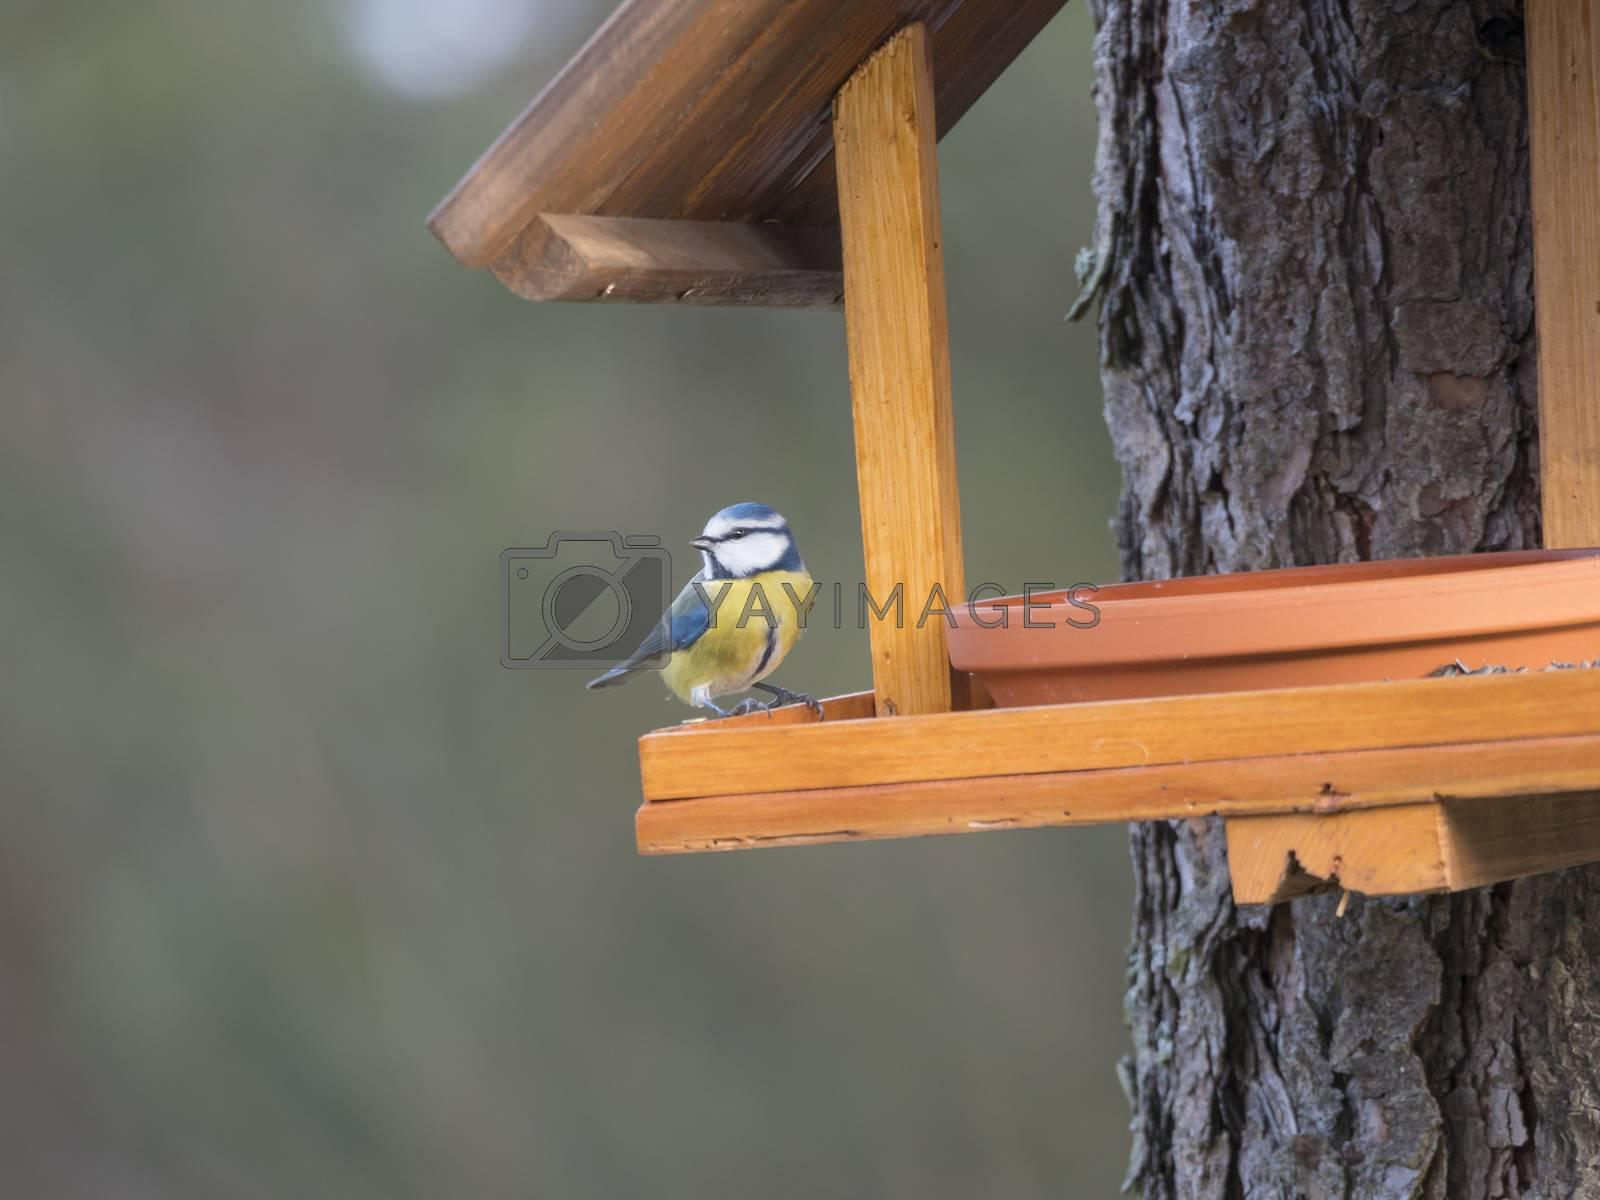 Close up Eurasian blue tit, Cyanistes caeruleus bird perched on the bird feeder table with sunflower seed. Bird feeding concept. Selective focus